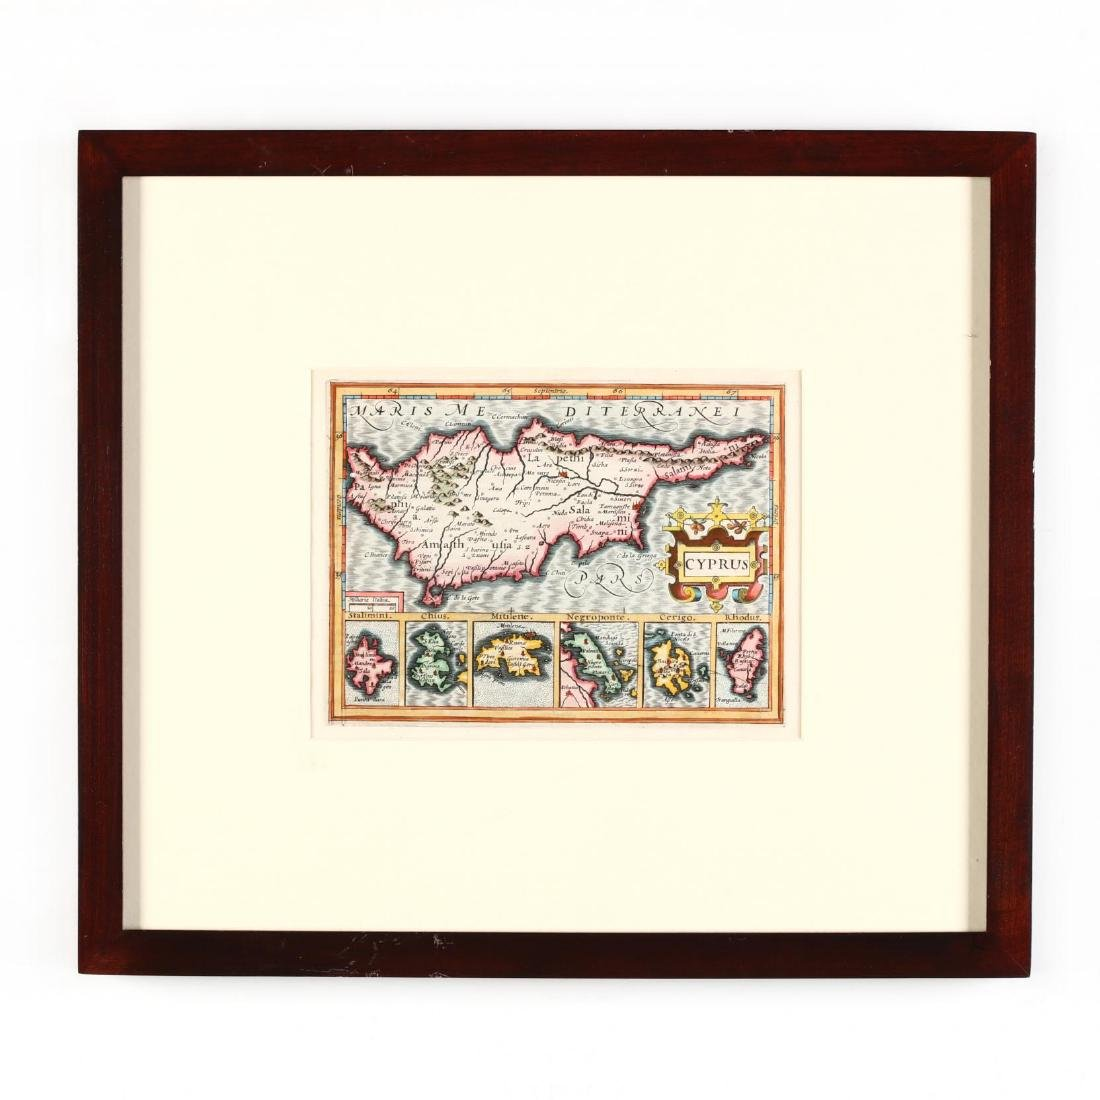 Mercator, Gerard and Hondius, Jodocus.  Cyprus